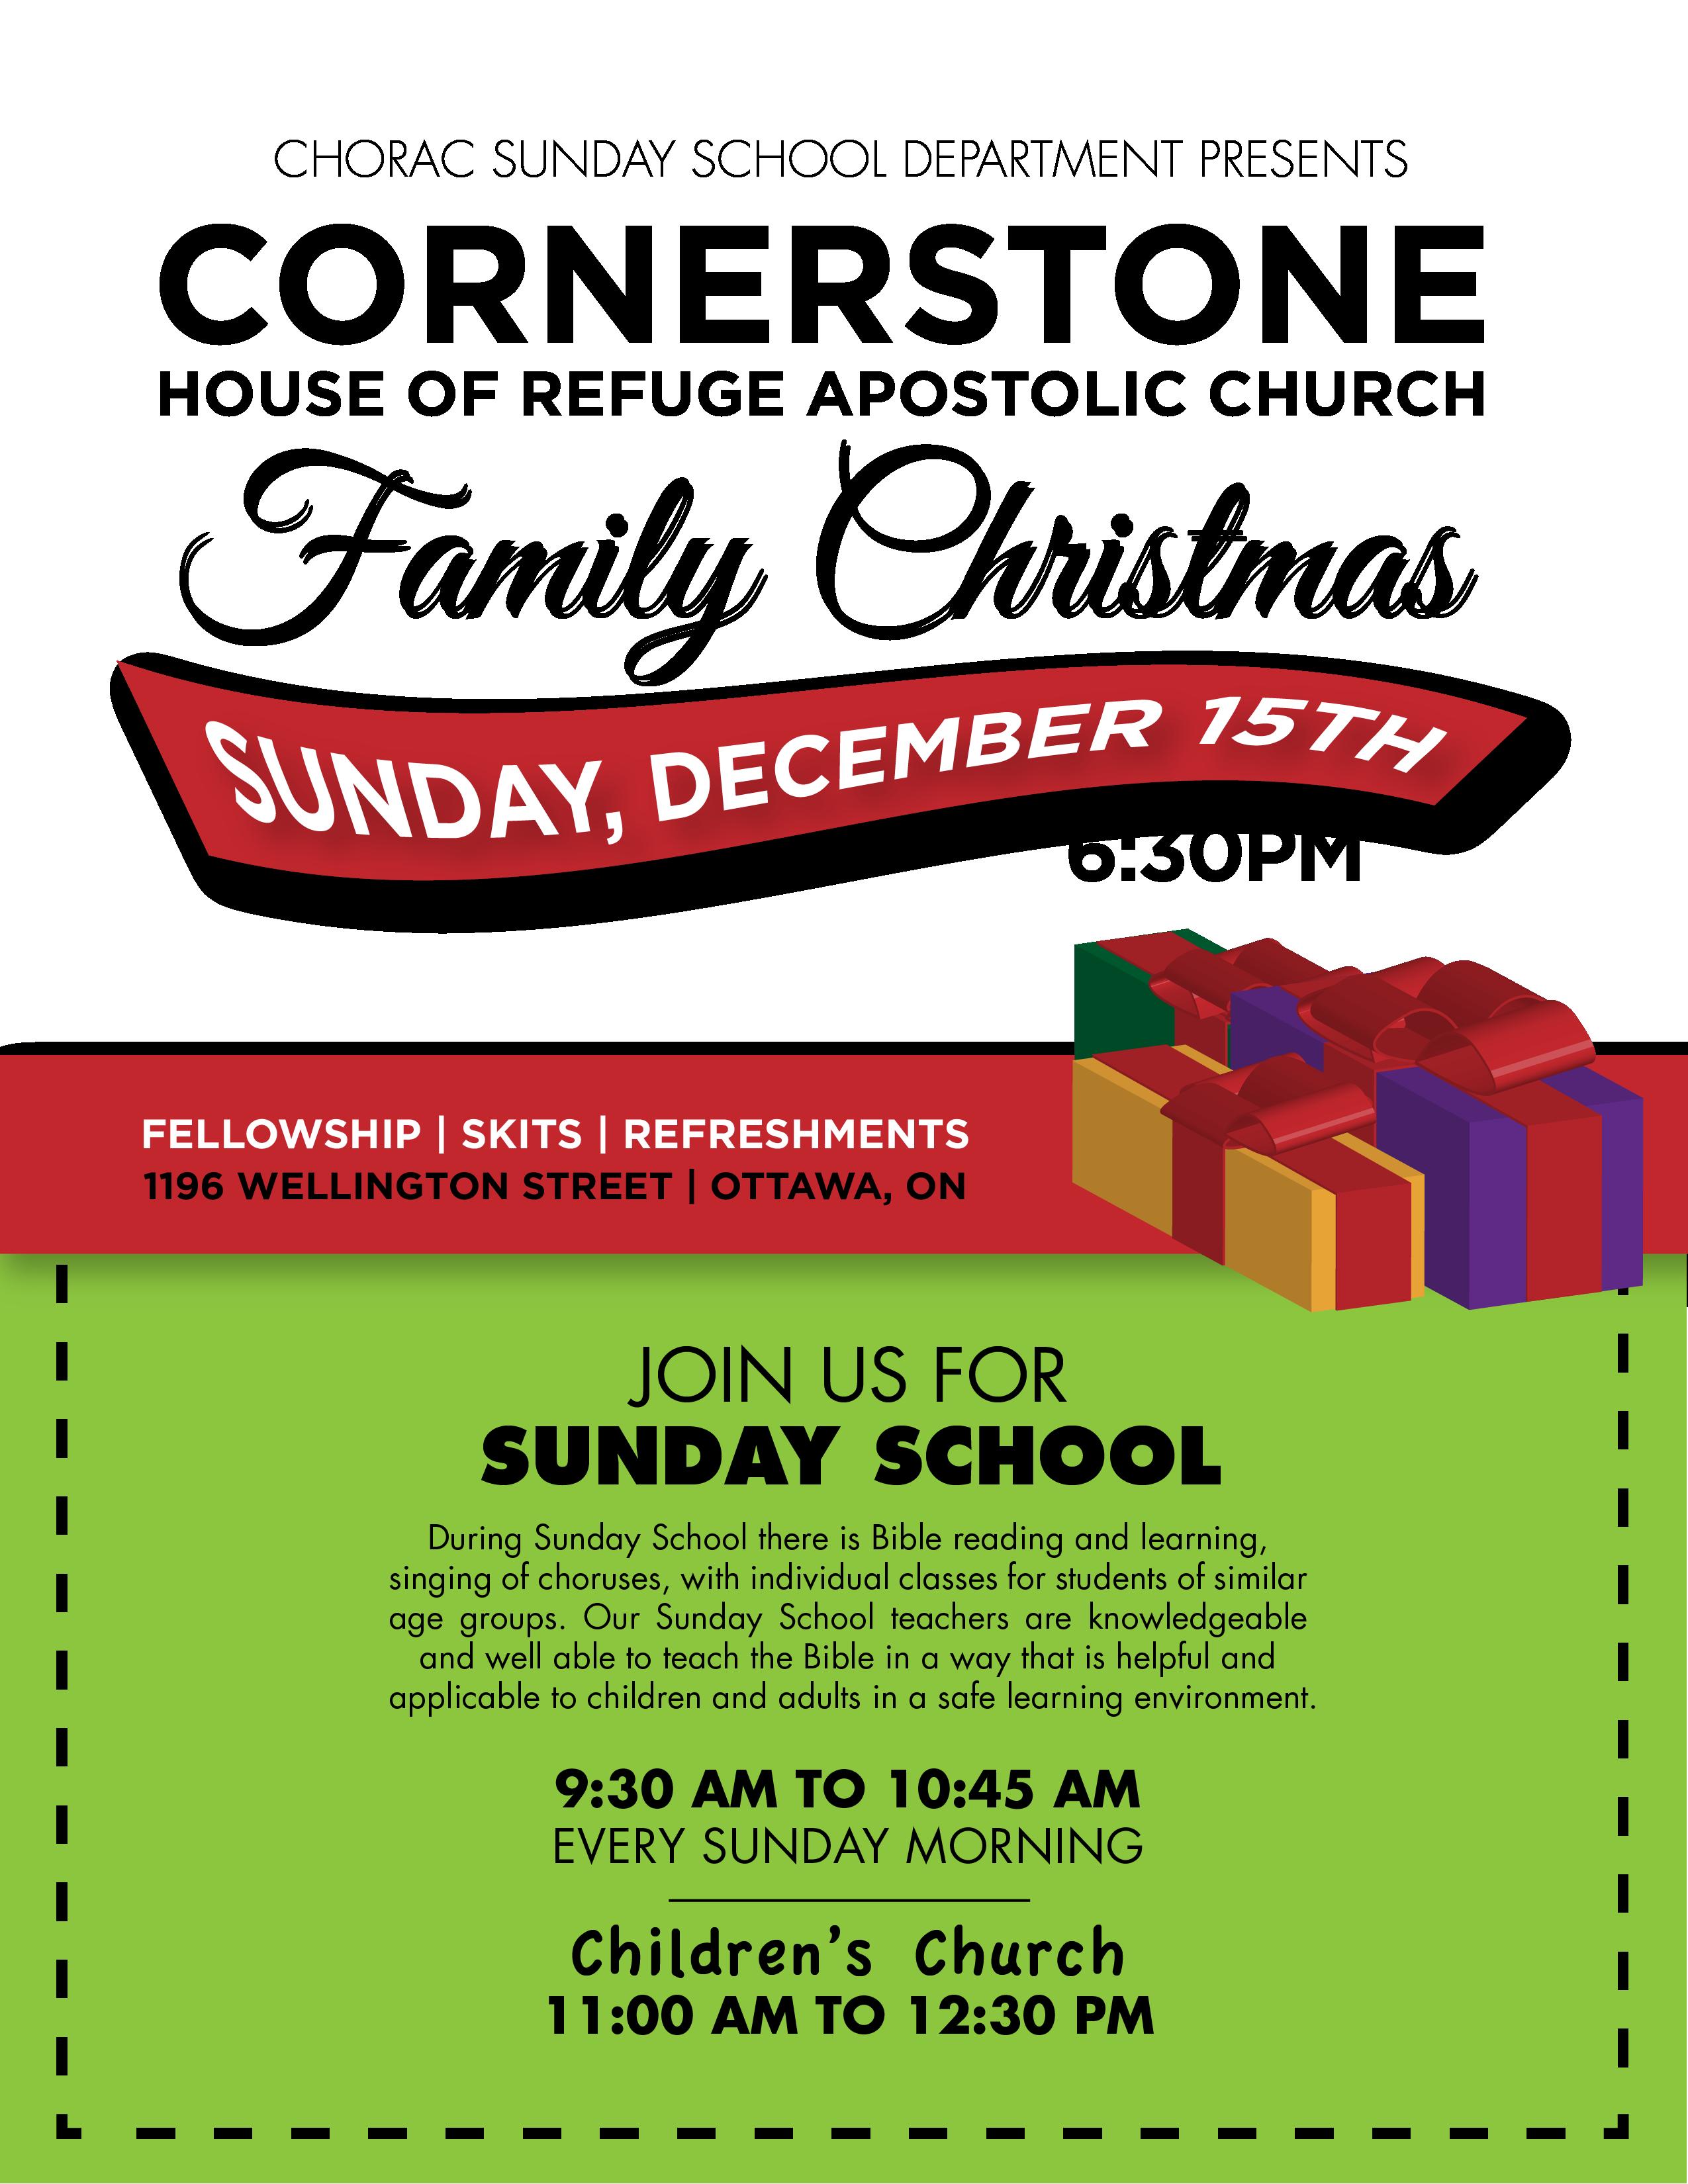 Sunday School Christmas Program | Cornerstone House of Refuge ...